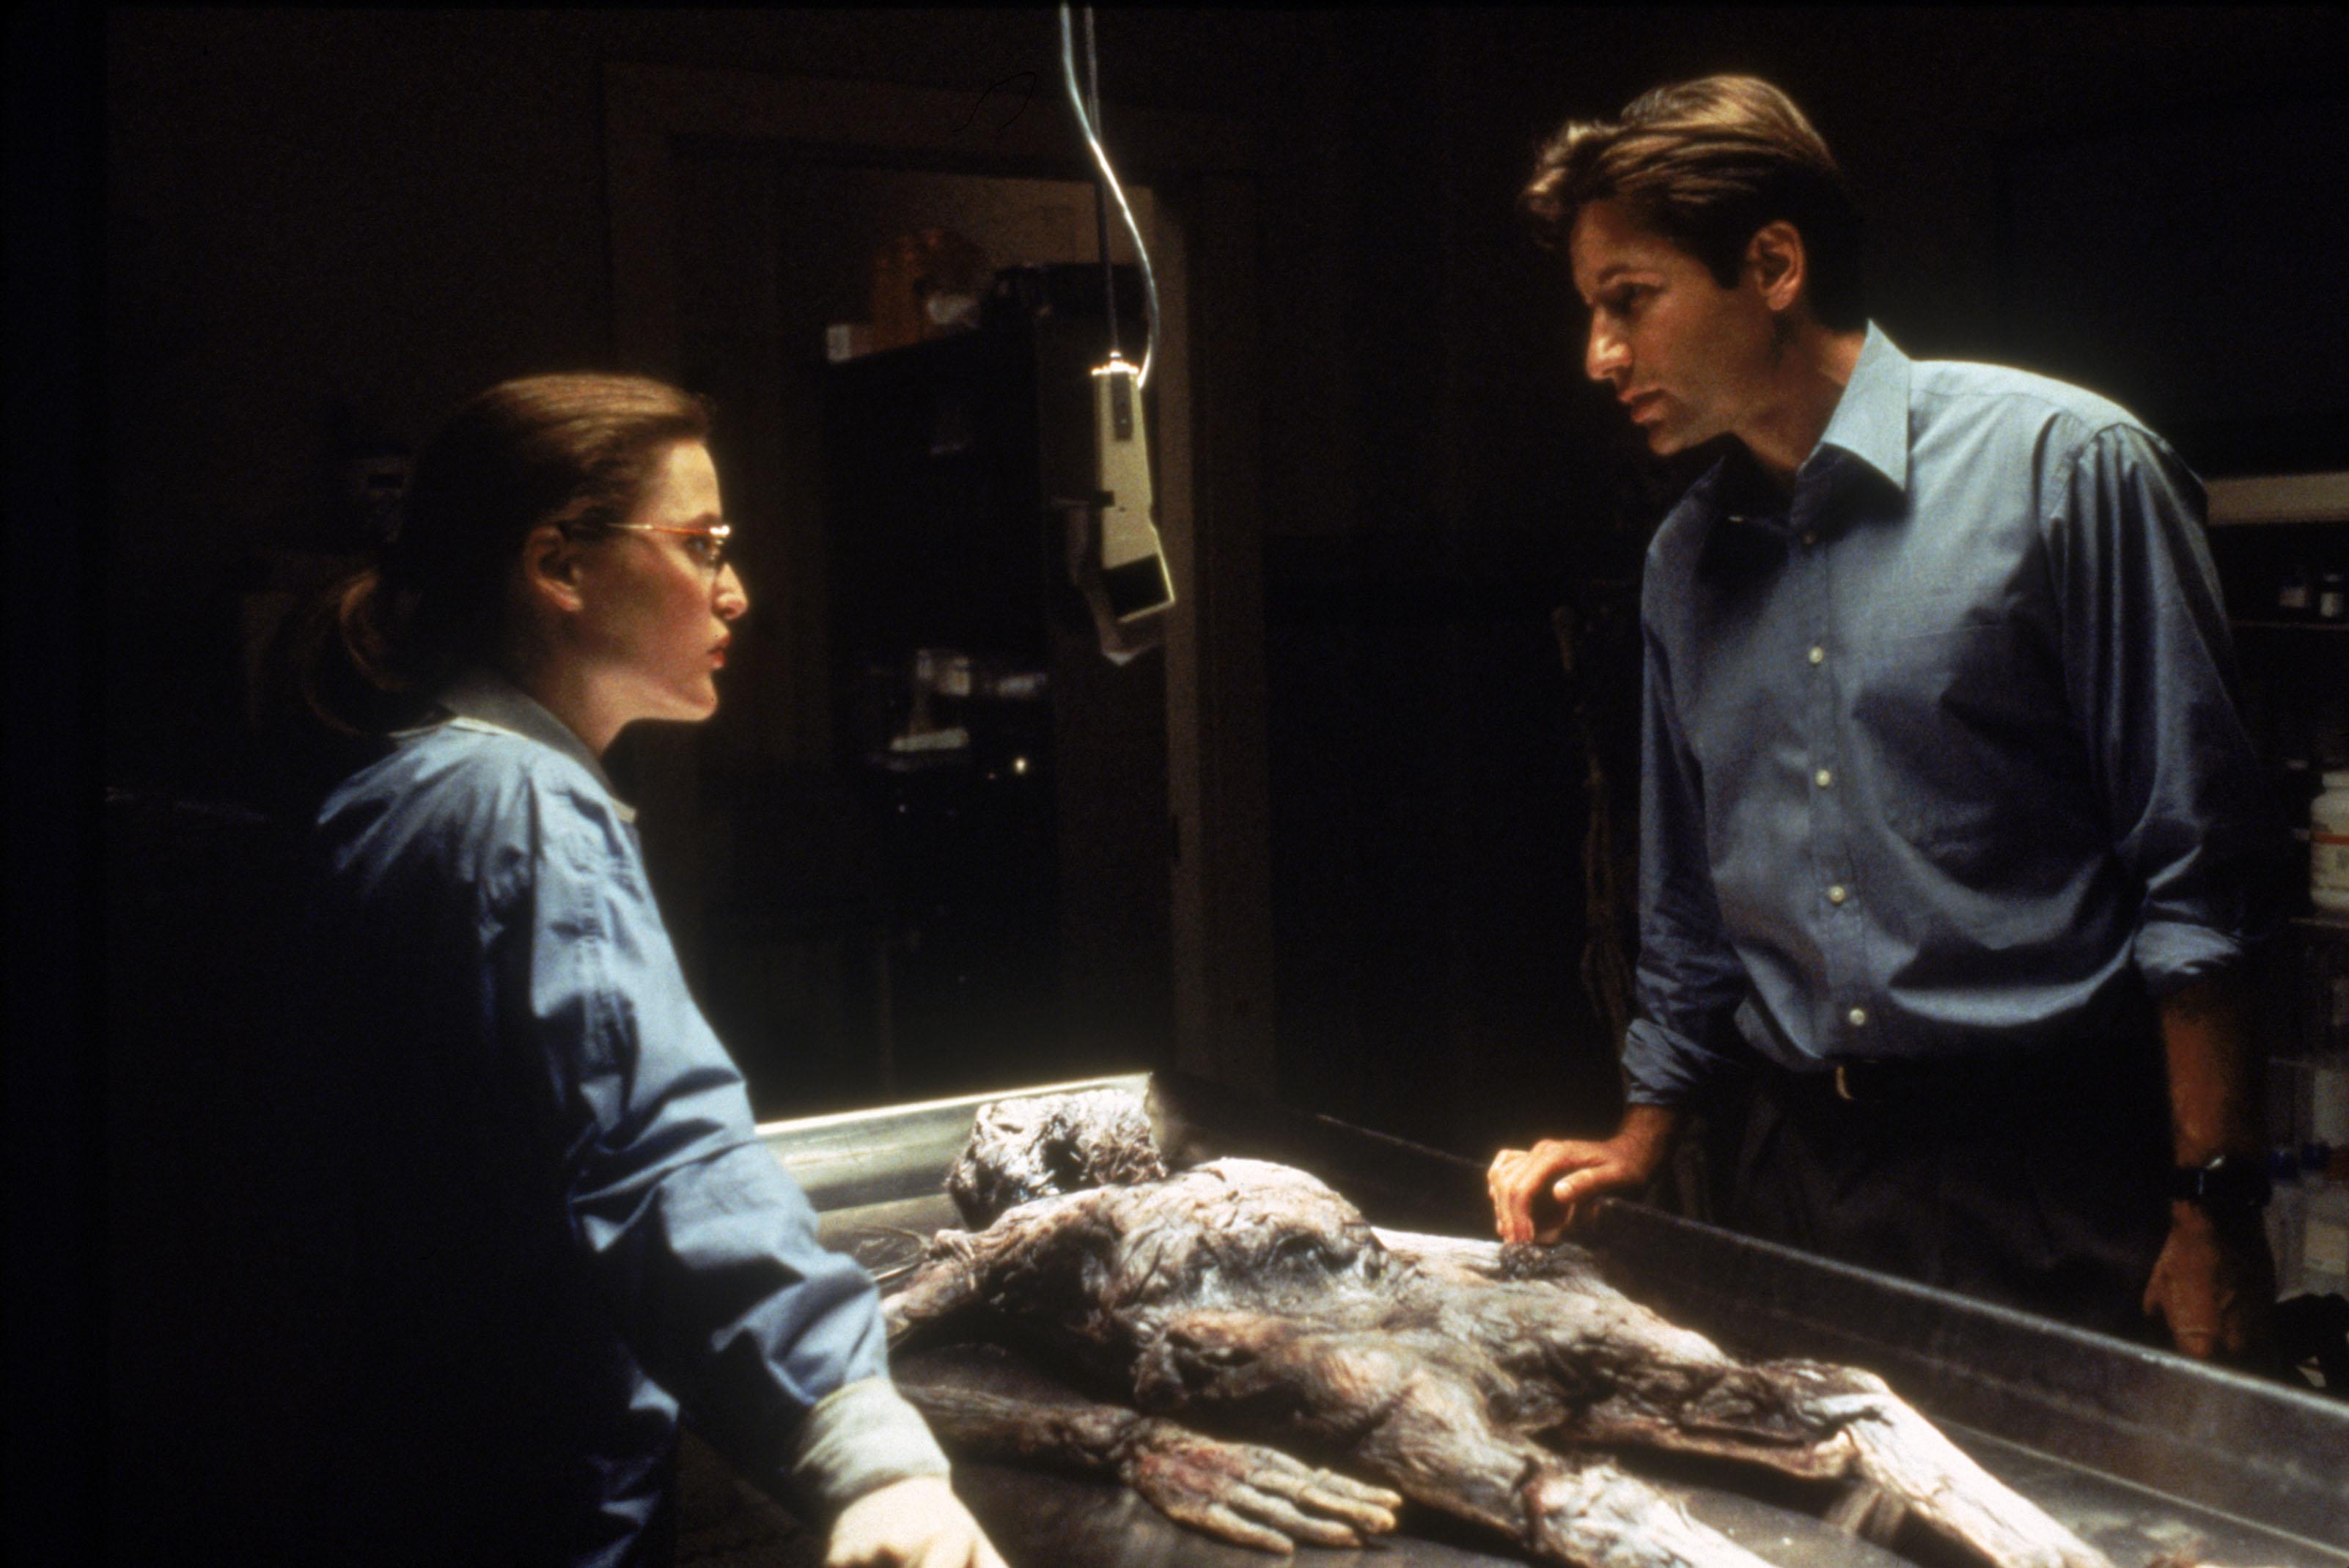 Секретные материалы (The X Files) 1993 — ...